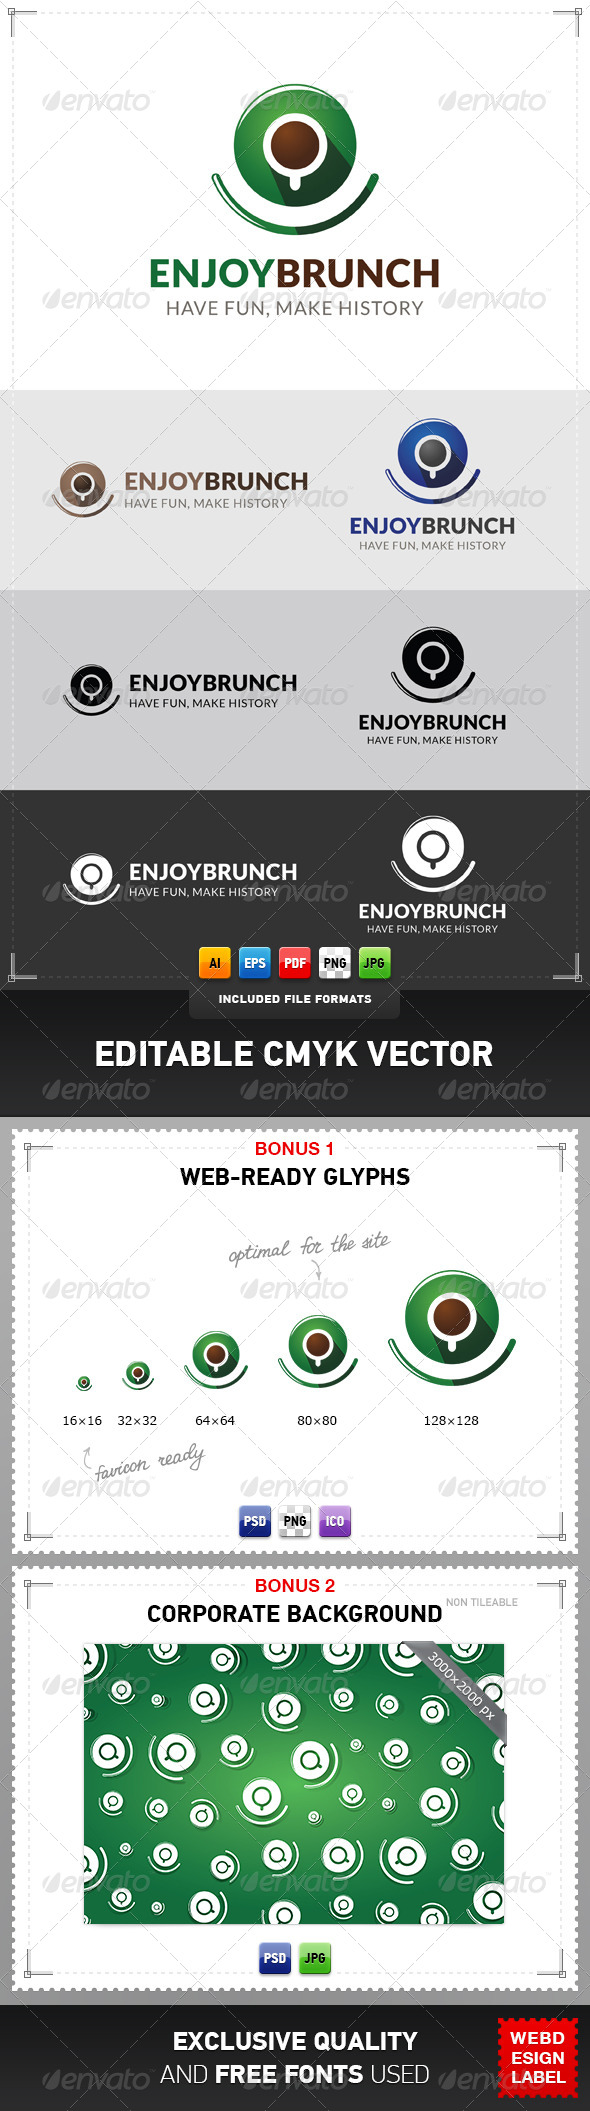 GraphicRiver Enjoy Brunch Logo 5052590